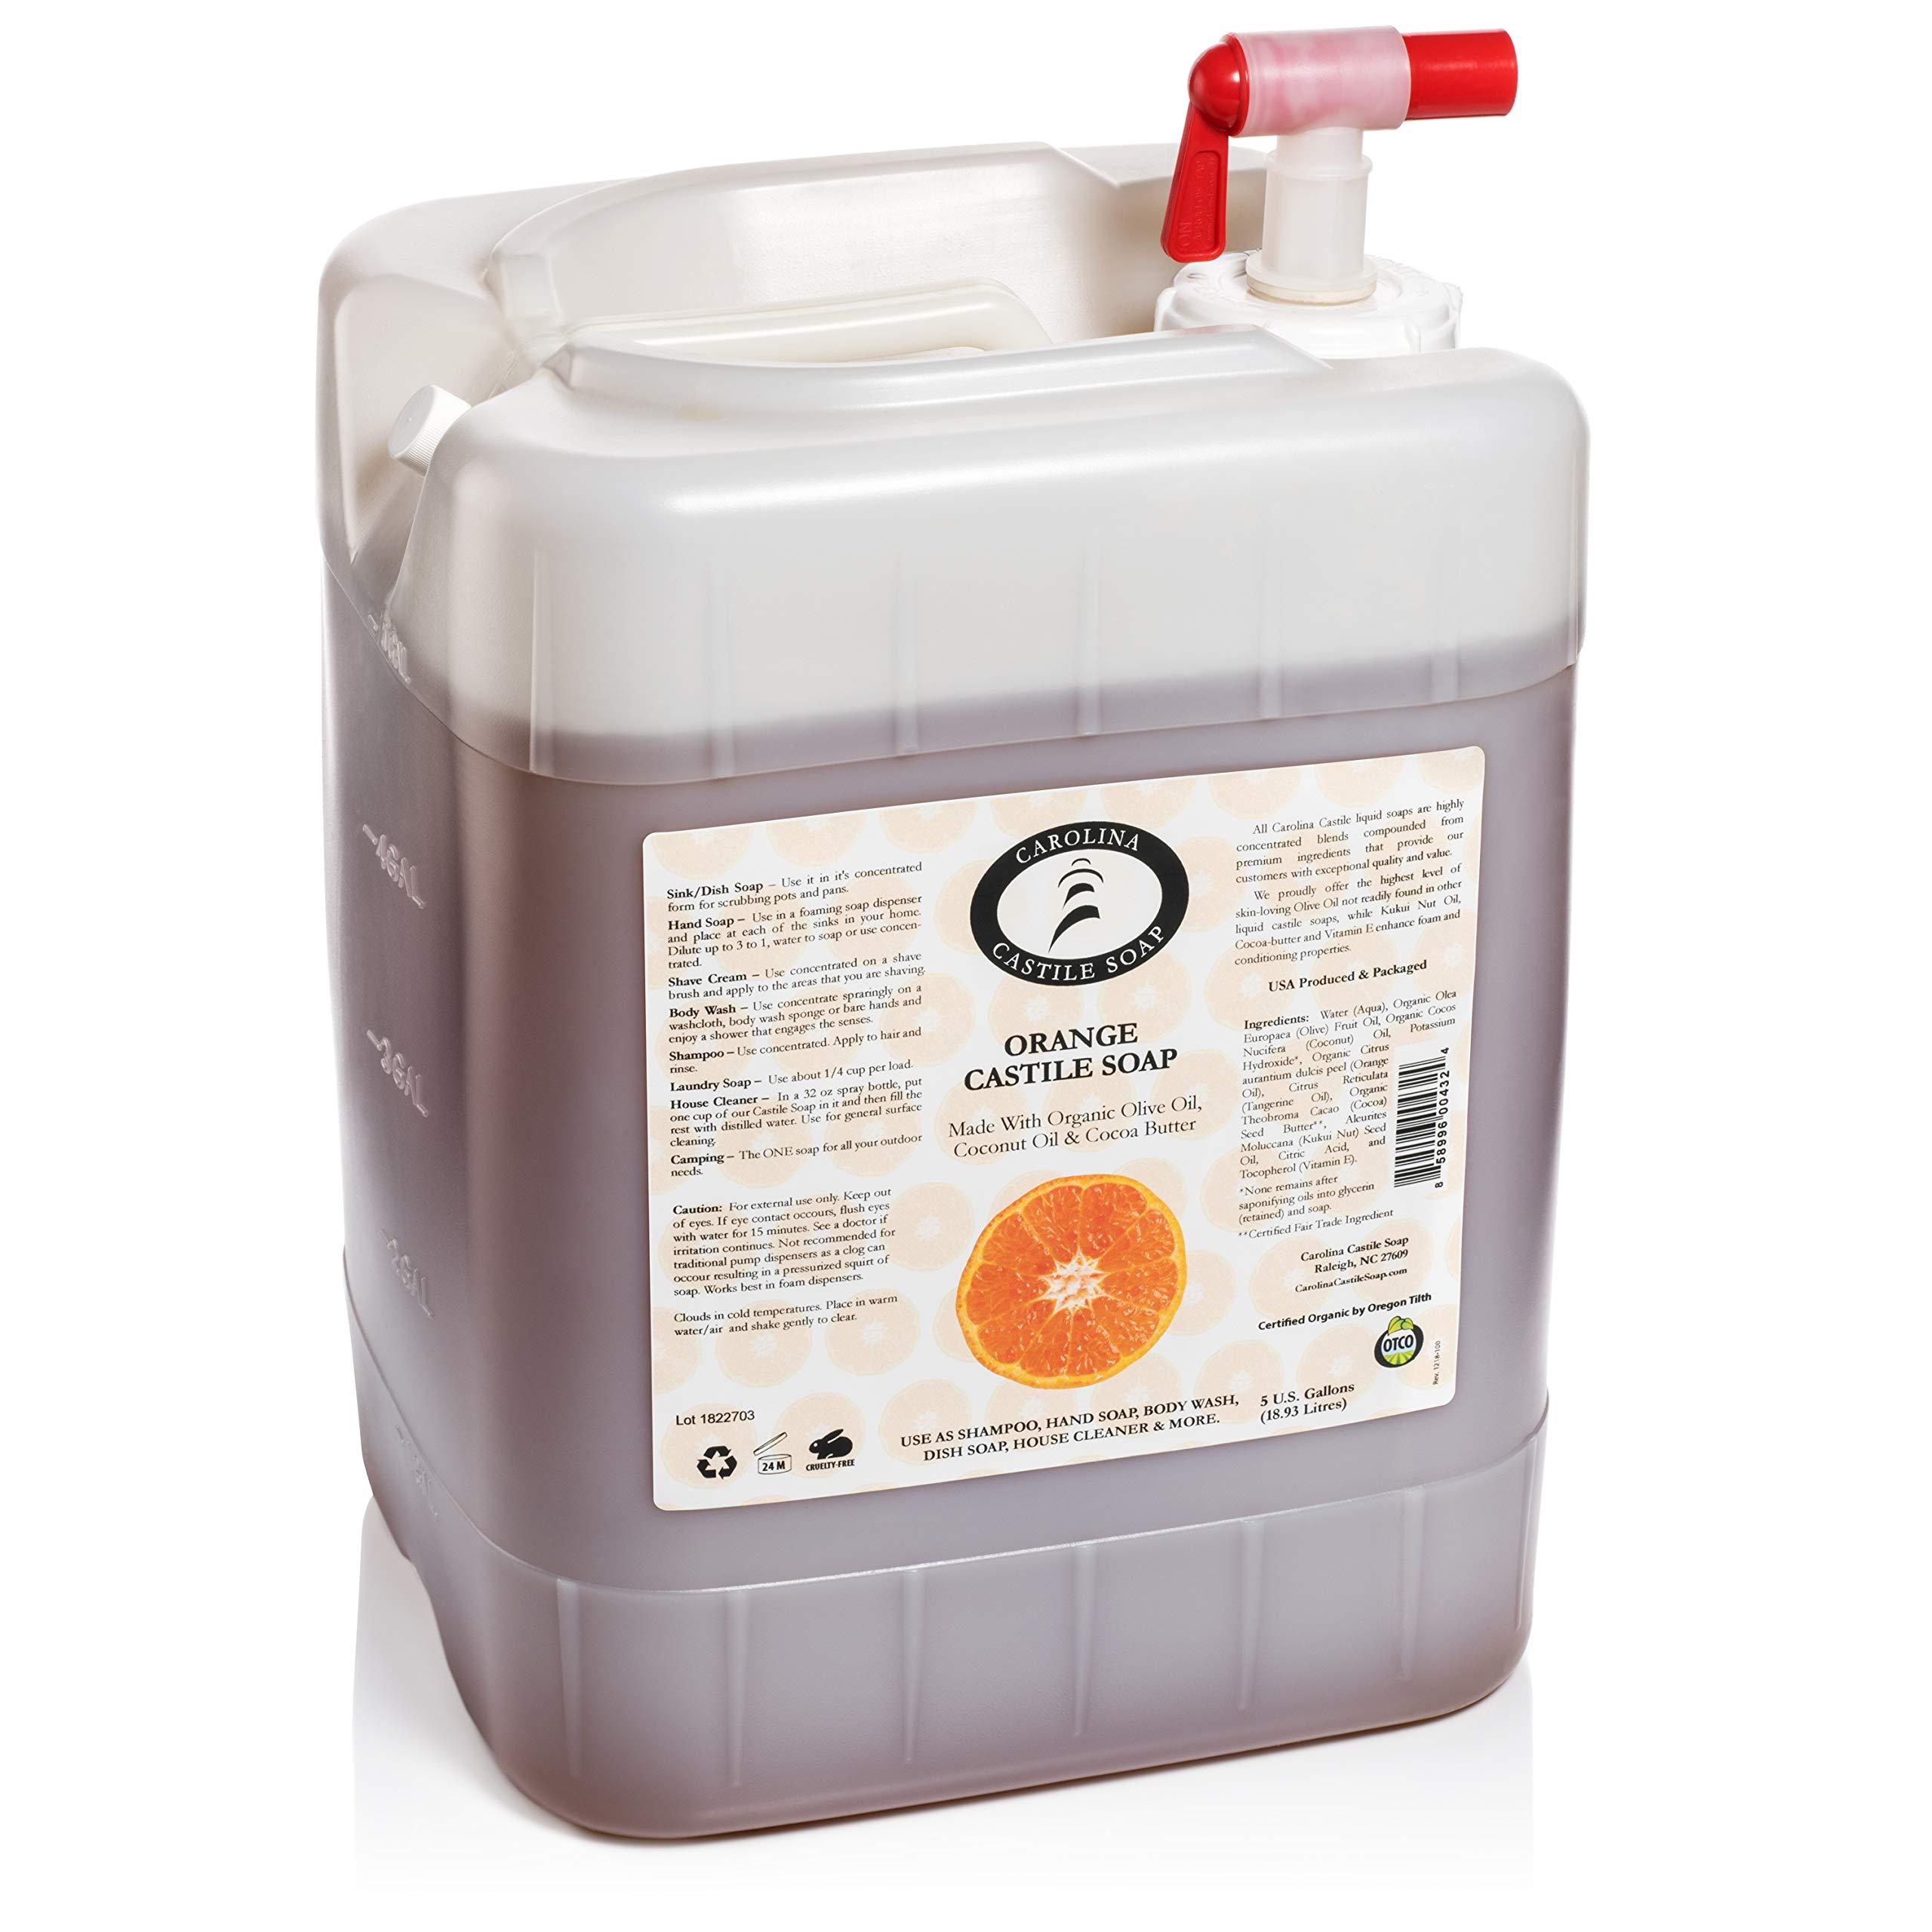 Orange Castile Soap (5 Gallon Jug) | Certified Organic